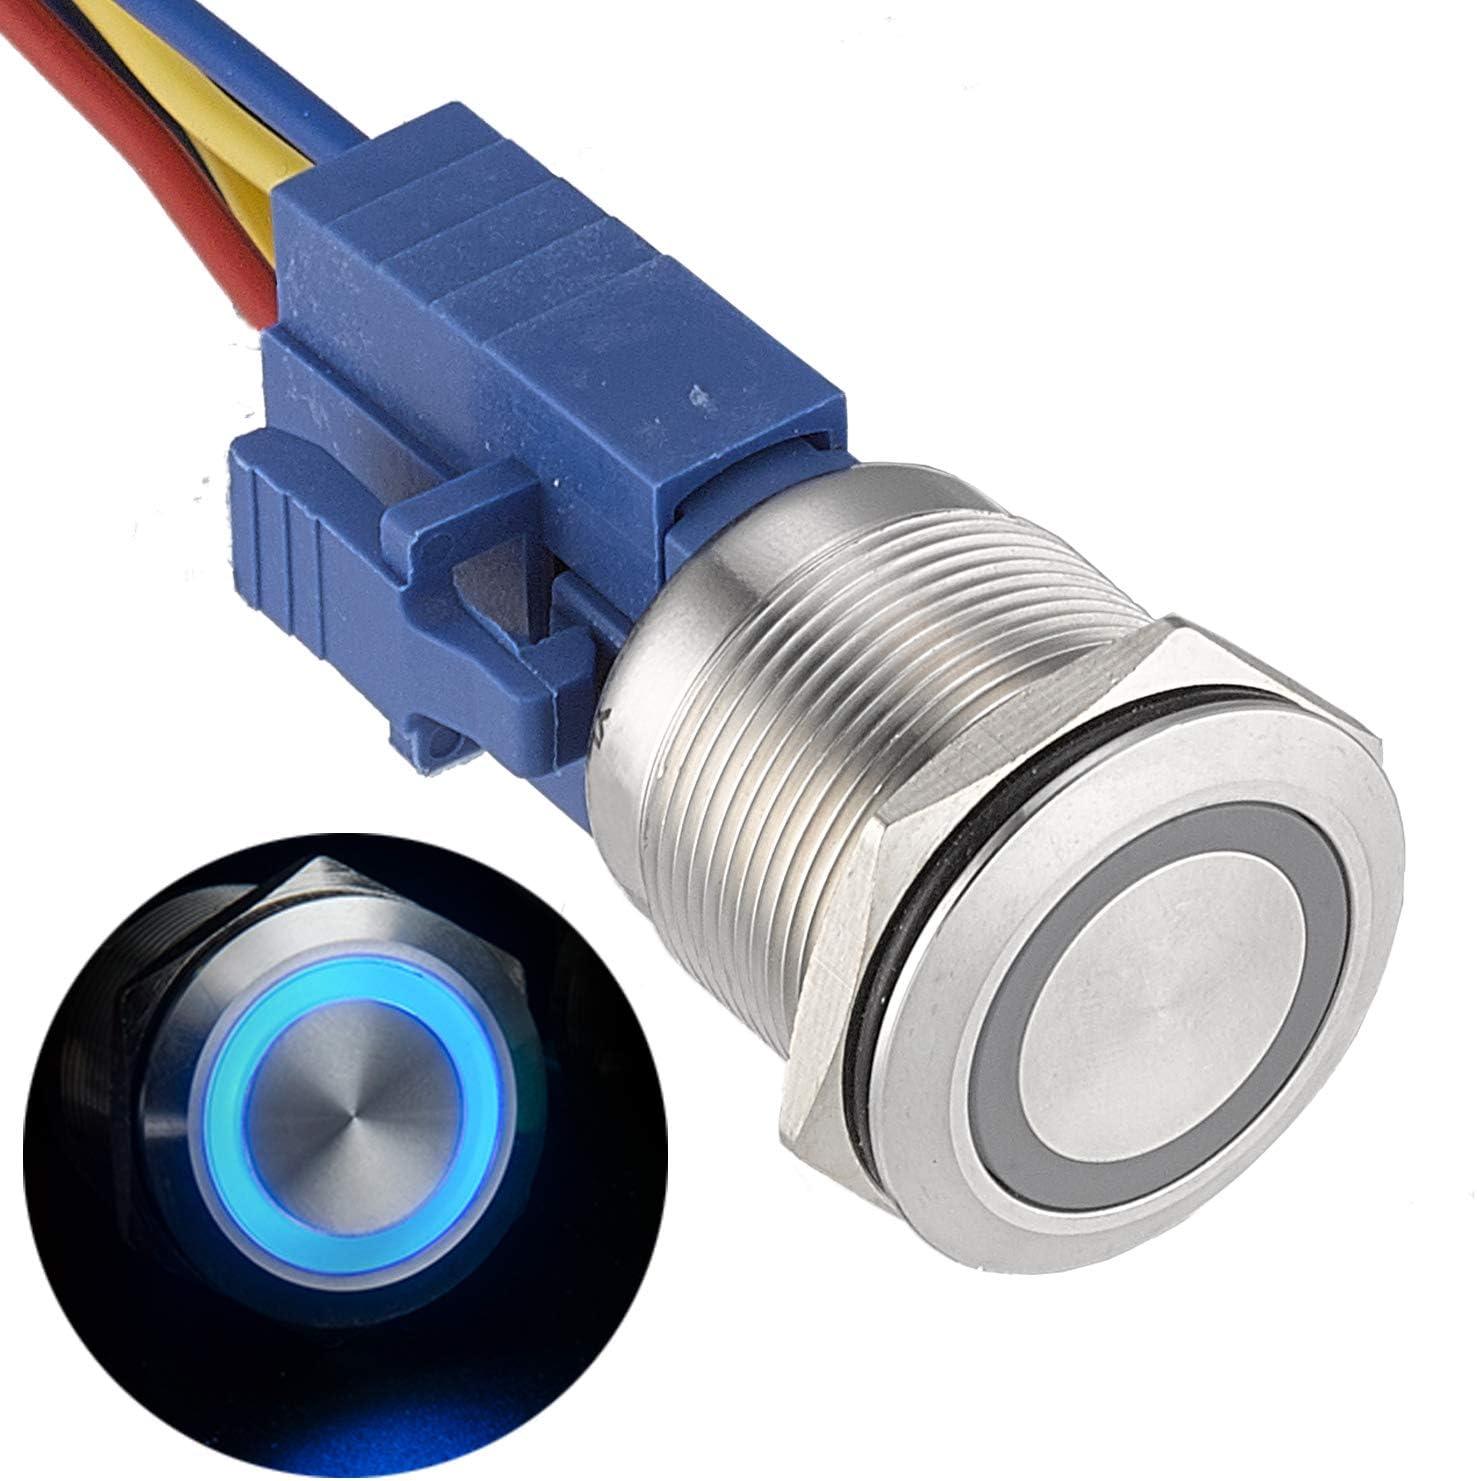 APIELE [3 year warranty] 22mm Latching Push button Switch 12V Angel Eye Ring Light LED Waterproof Stainless Steel Round Metal Self-locking 7/8'' 1NO 1NC (Blue)